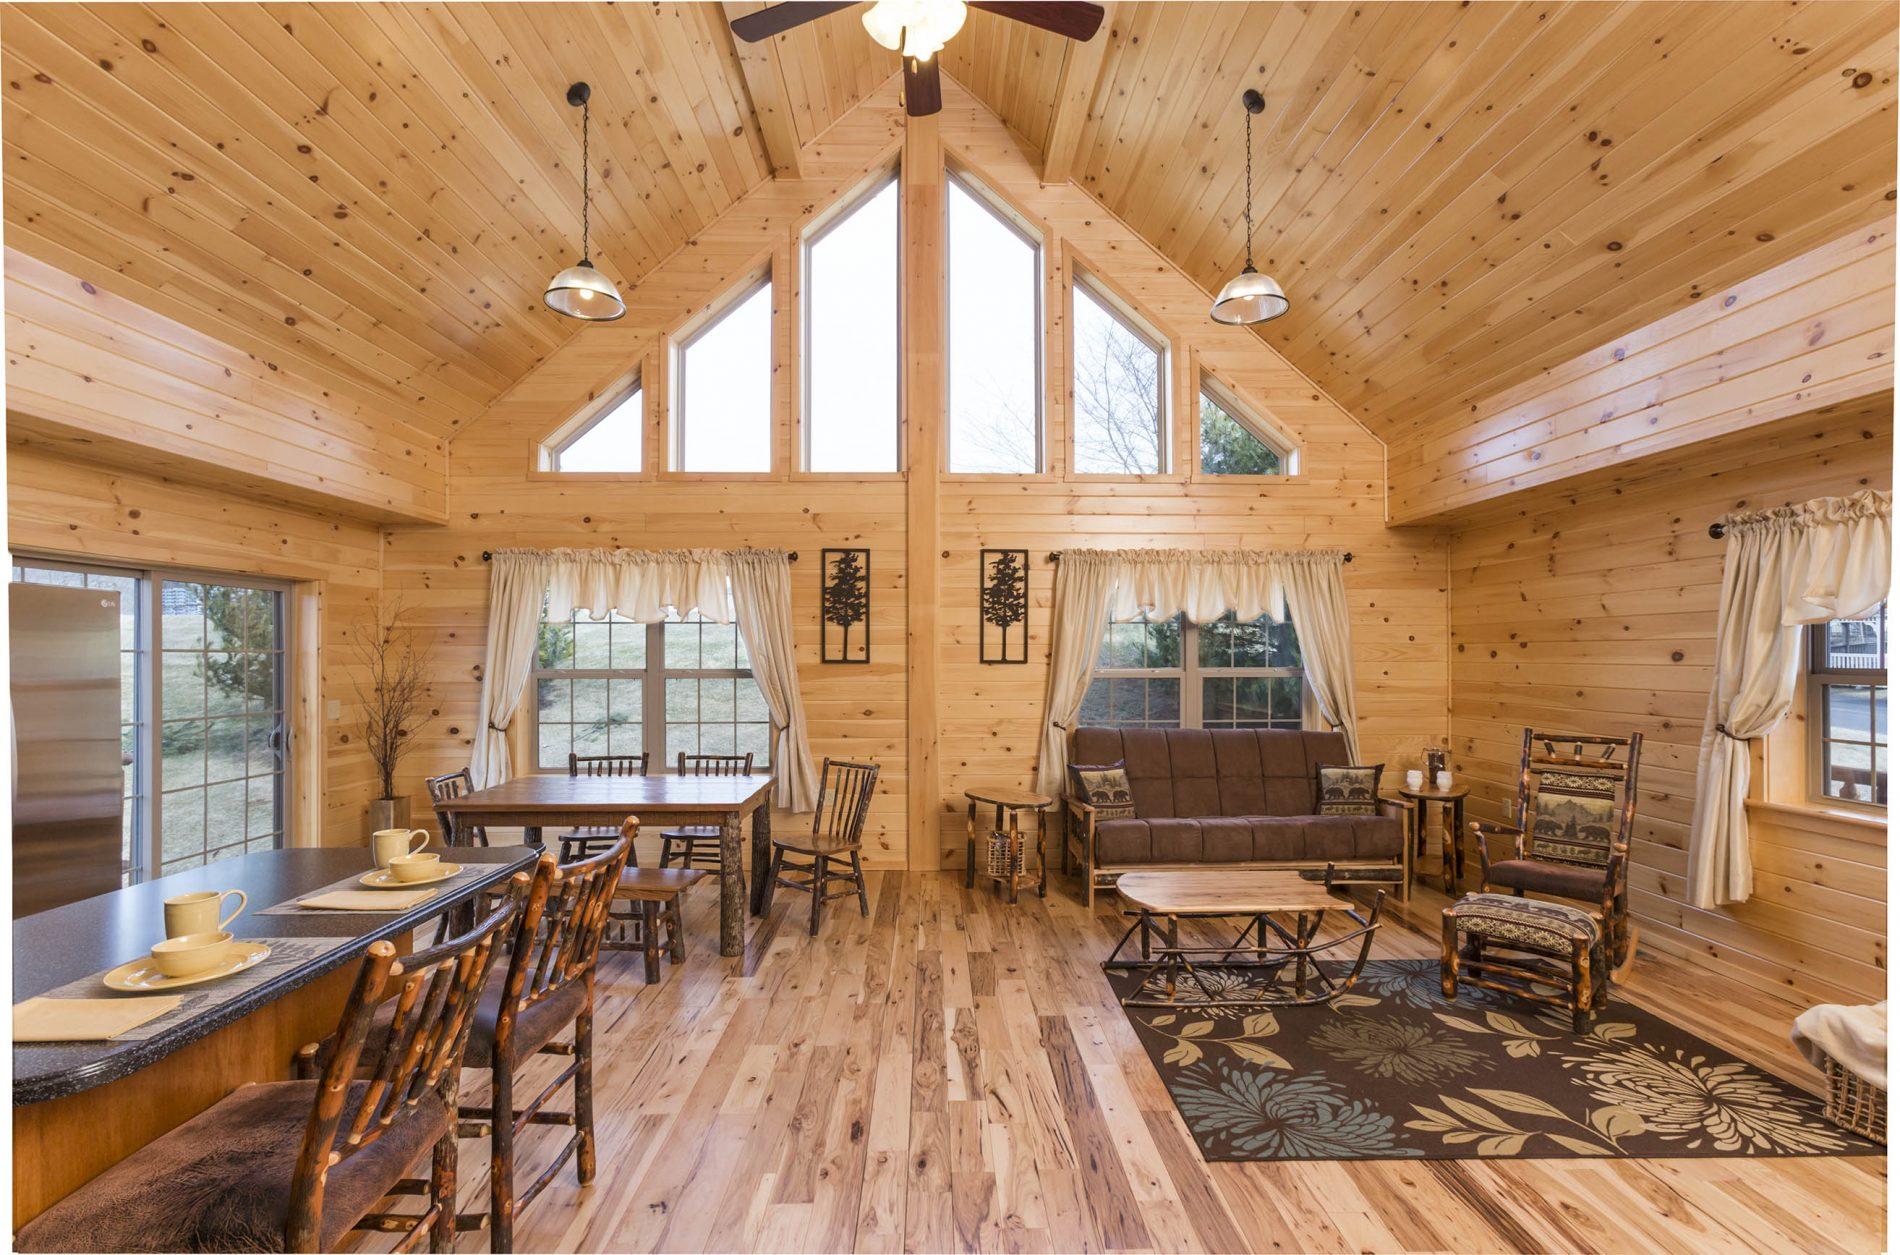 2021 Log Cabin Modular Homes Zook Cabins